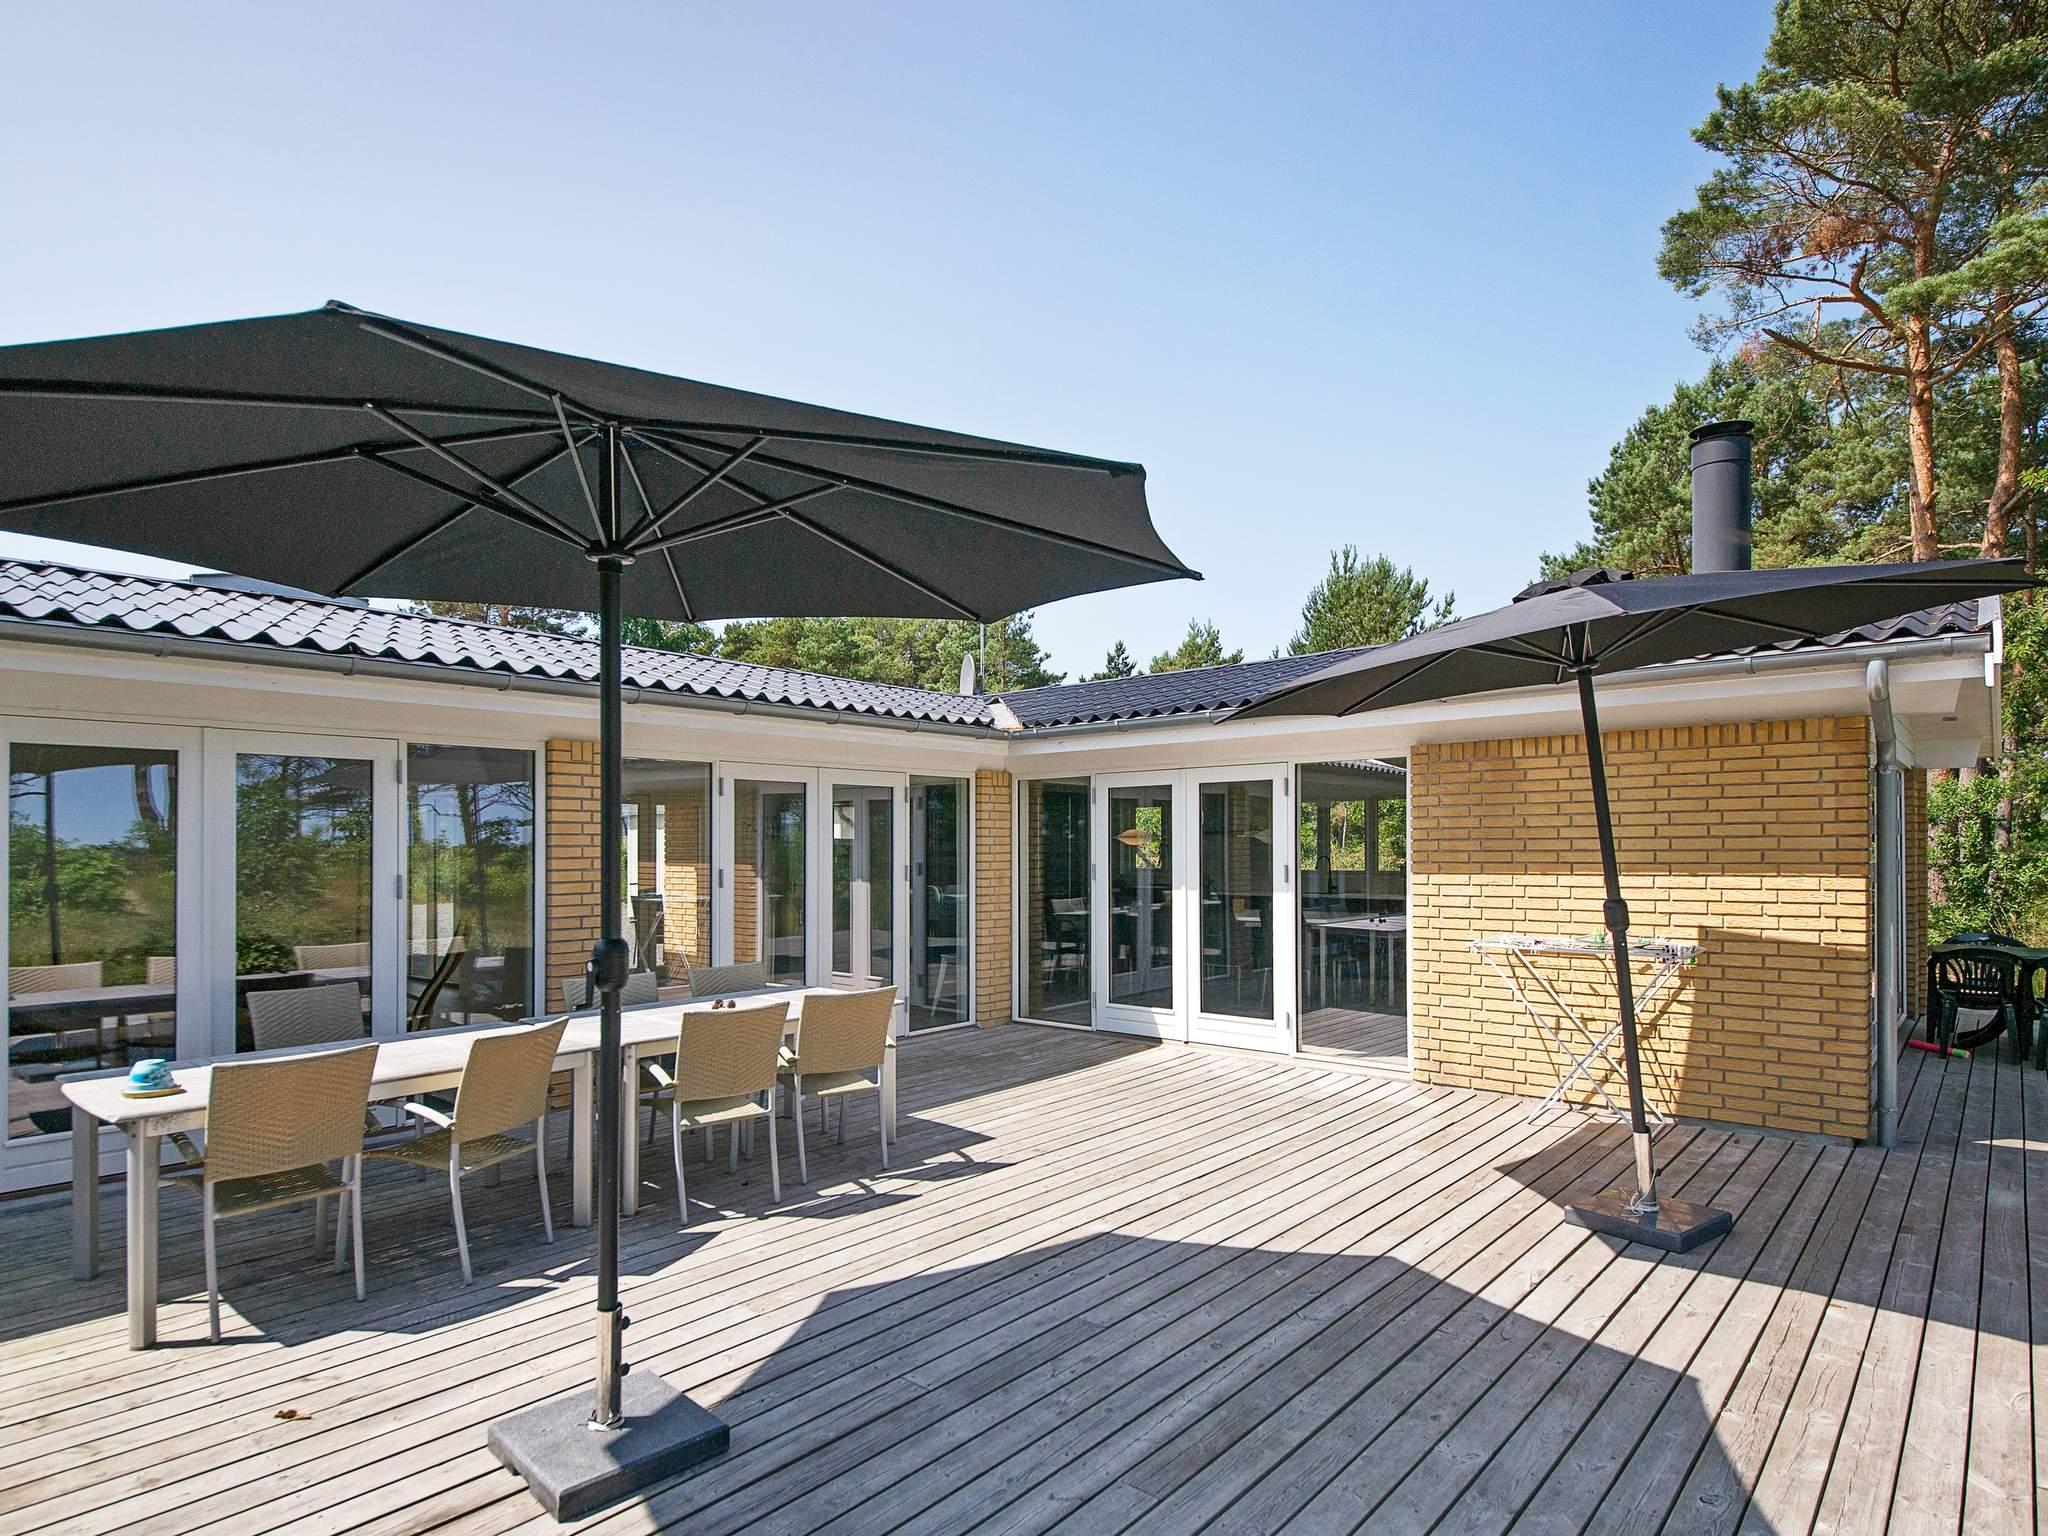 Ferienhaus Balka Strand (586595), Balke, , Bornholm, Dänemark, Bild 22